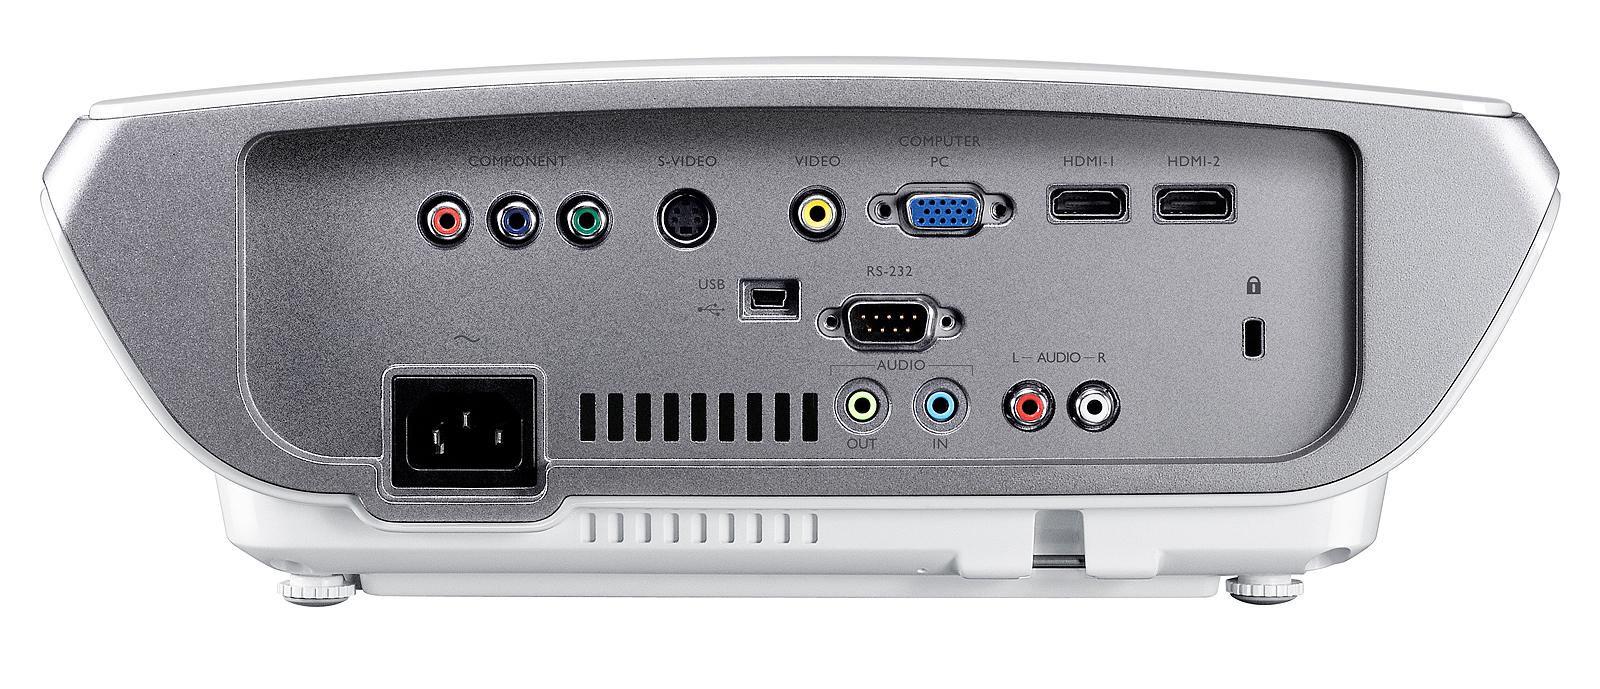 Видеопроектор benq w1060 интернет магазин